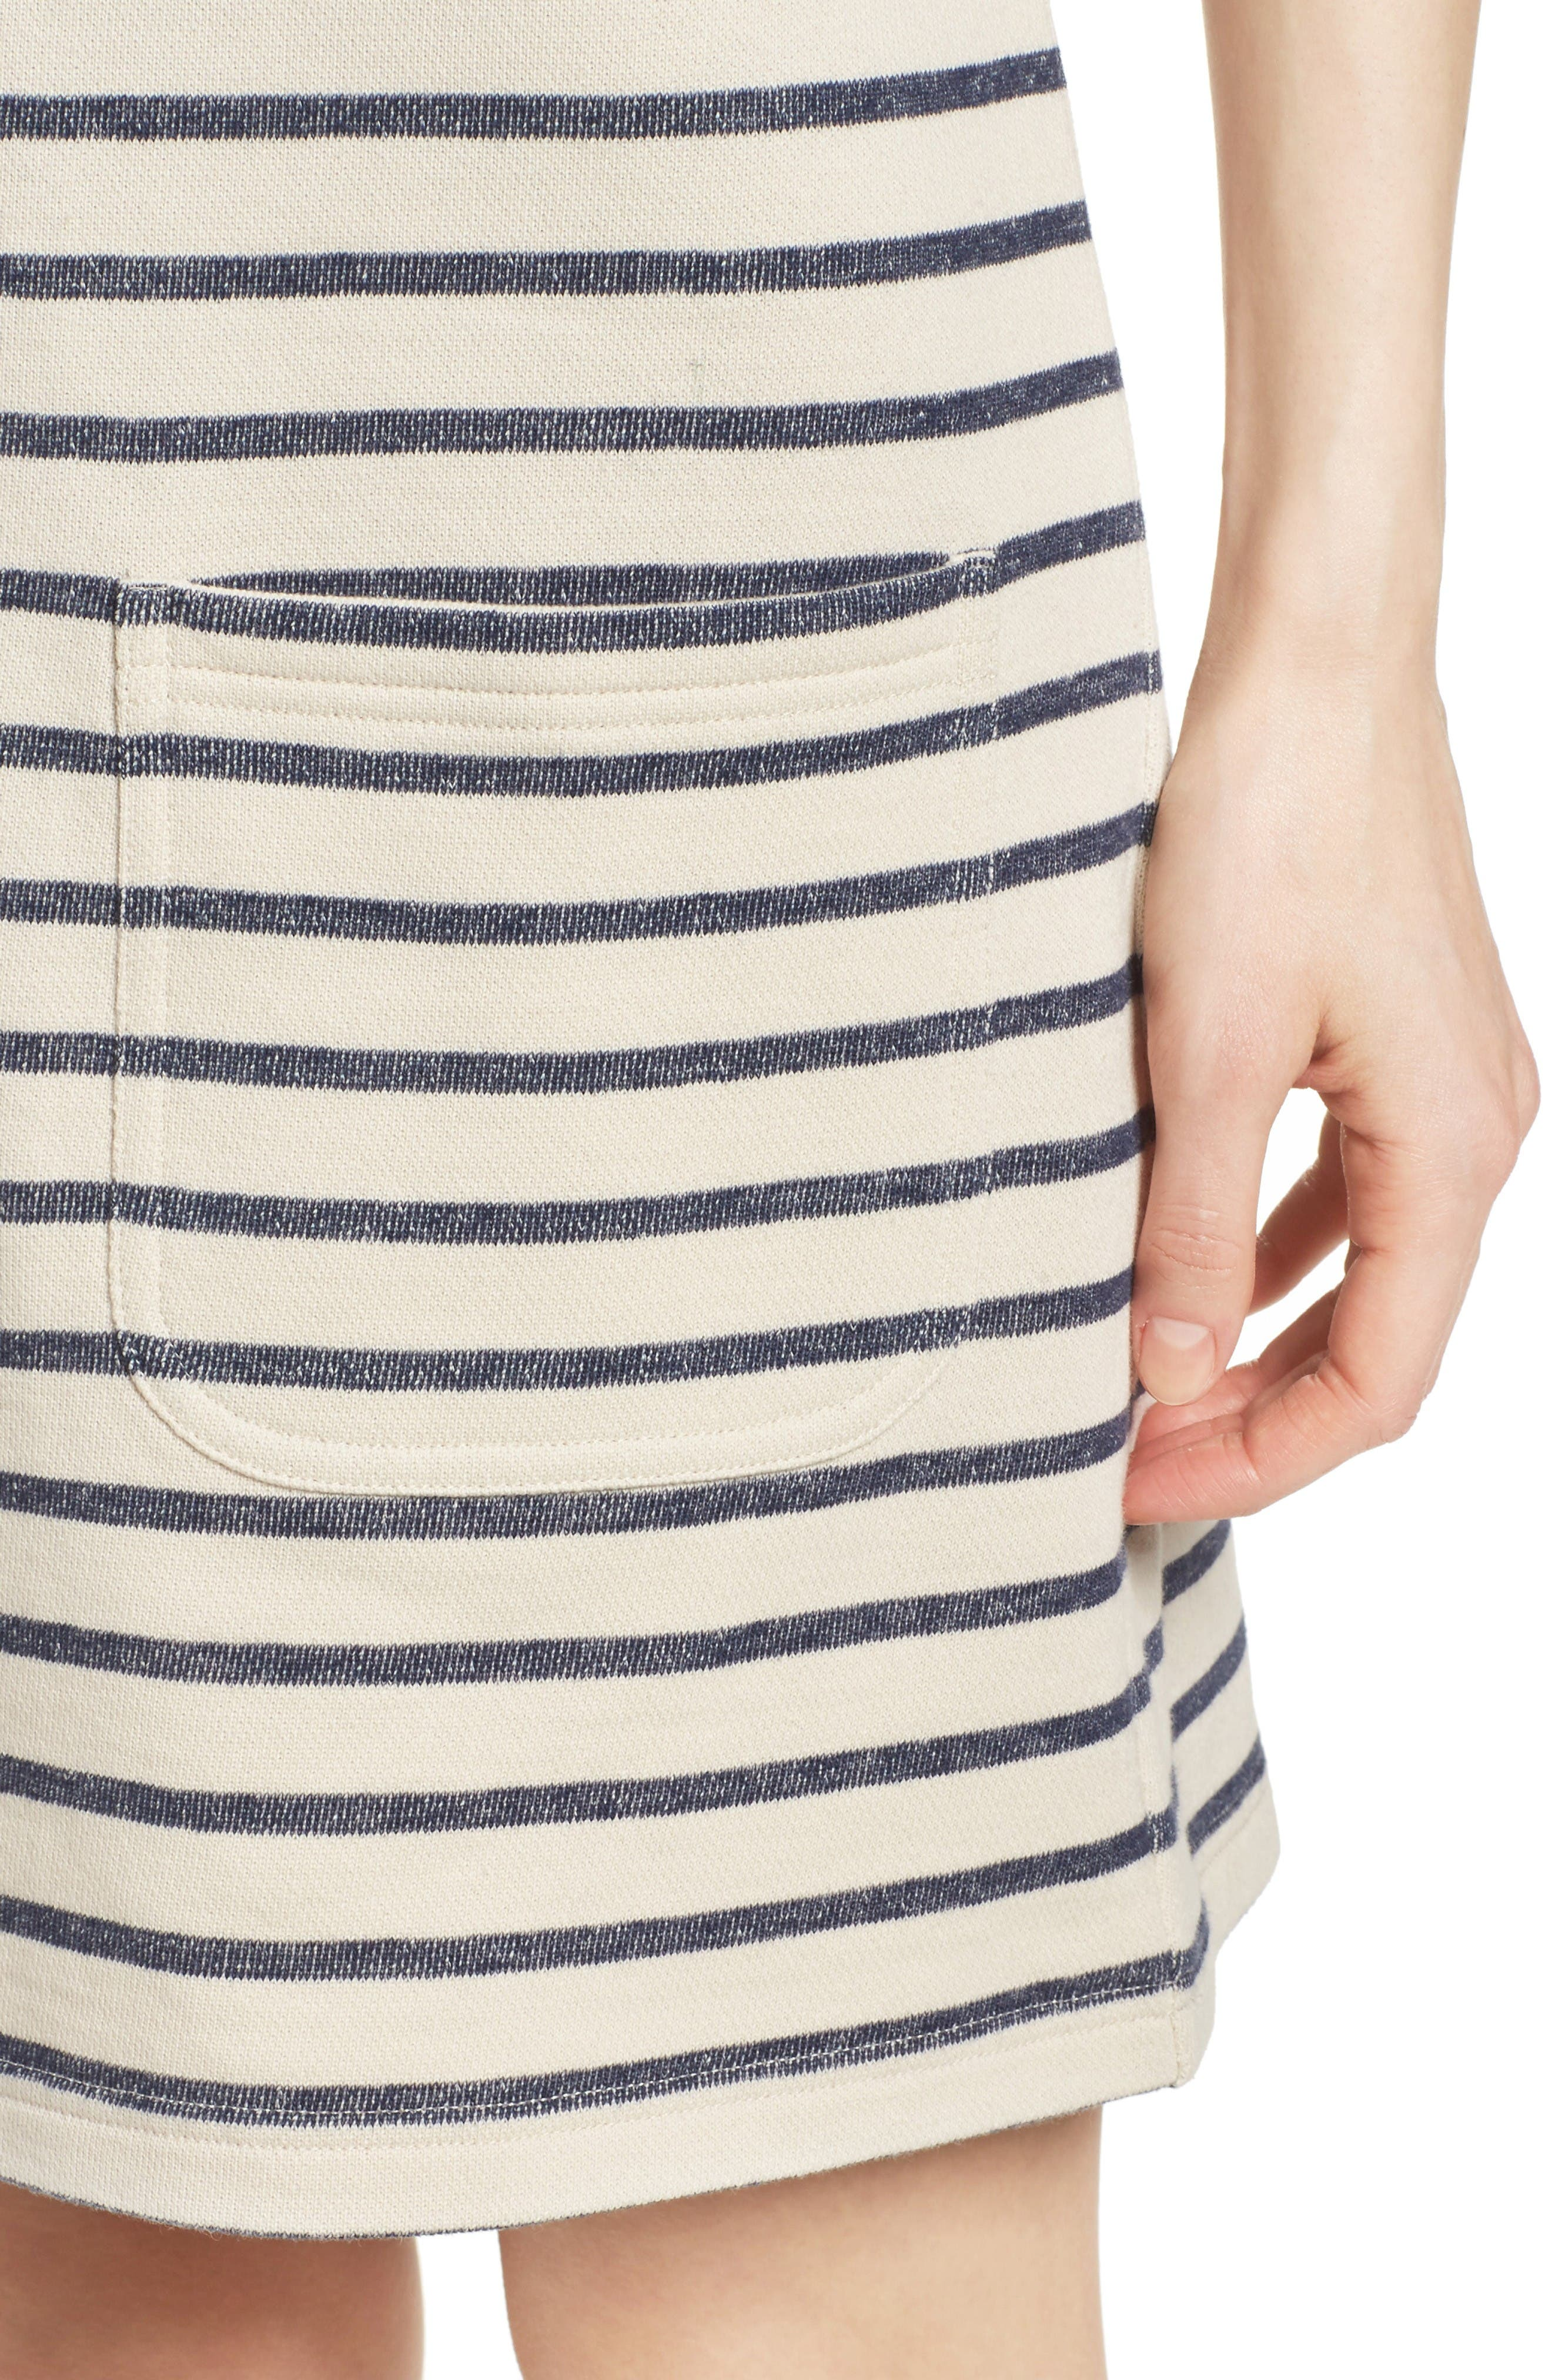 Normandy Stripe Dress,                             Alternate thumbnail 5, color,                             Brule/ Indigo